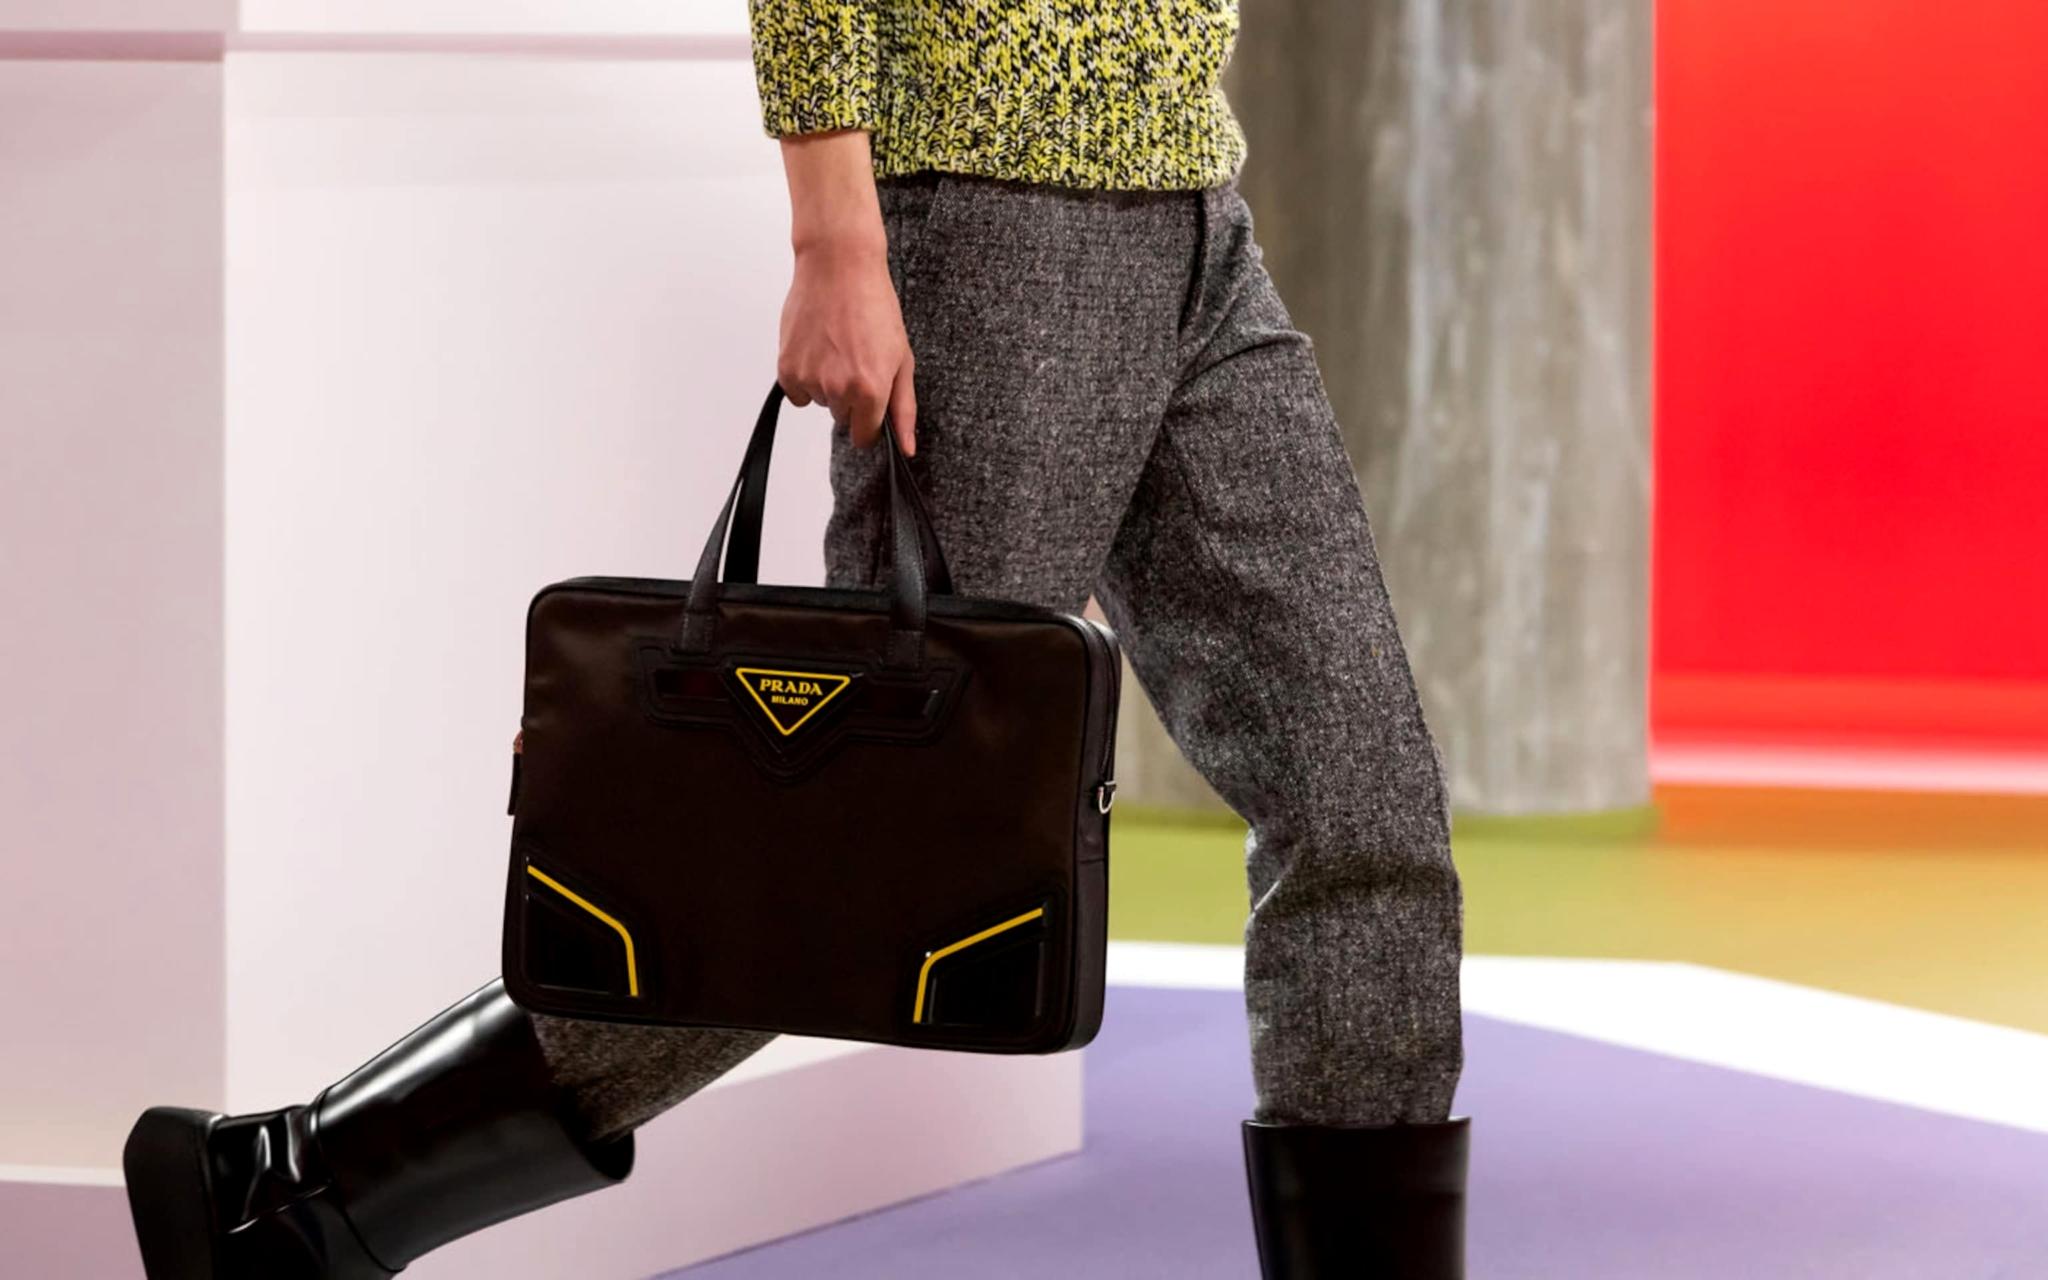 Сумка из коллекции Prada Fall/Winter 2020 Menswear